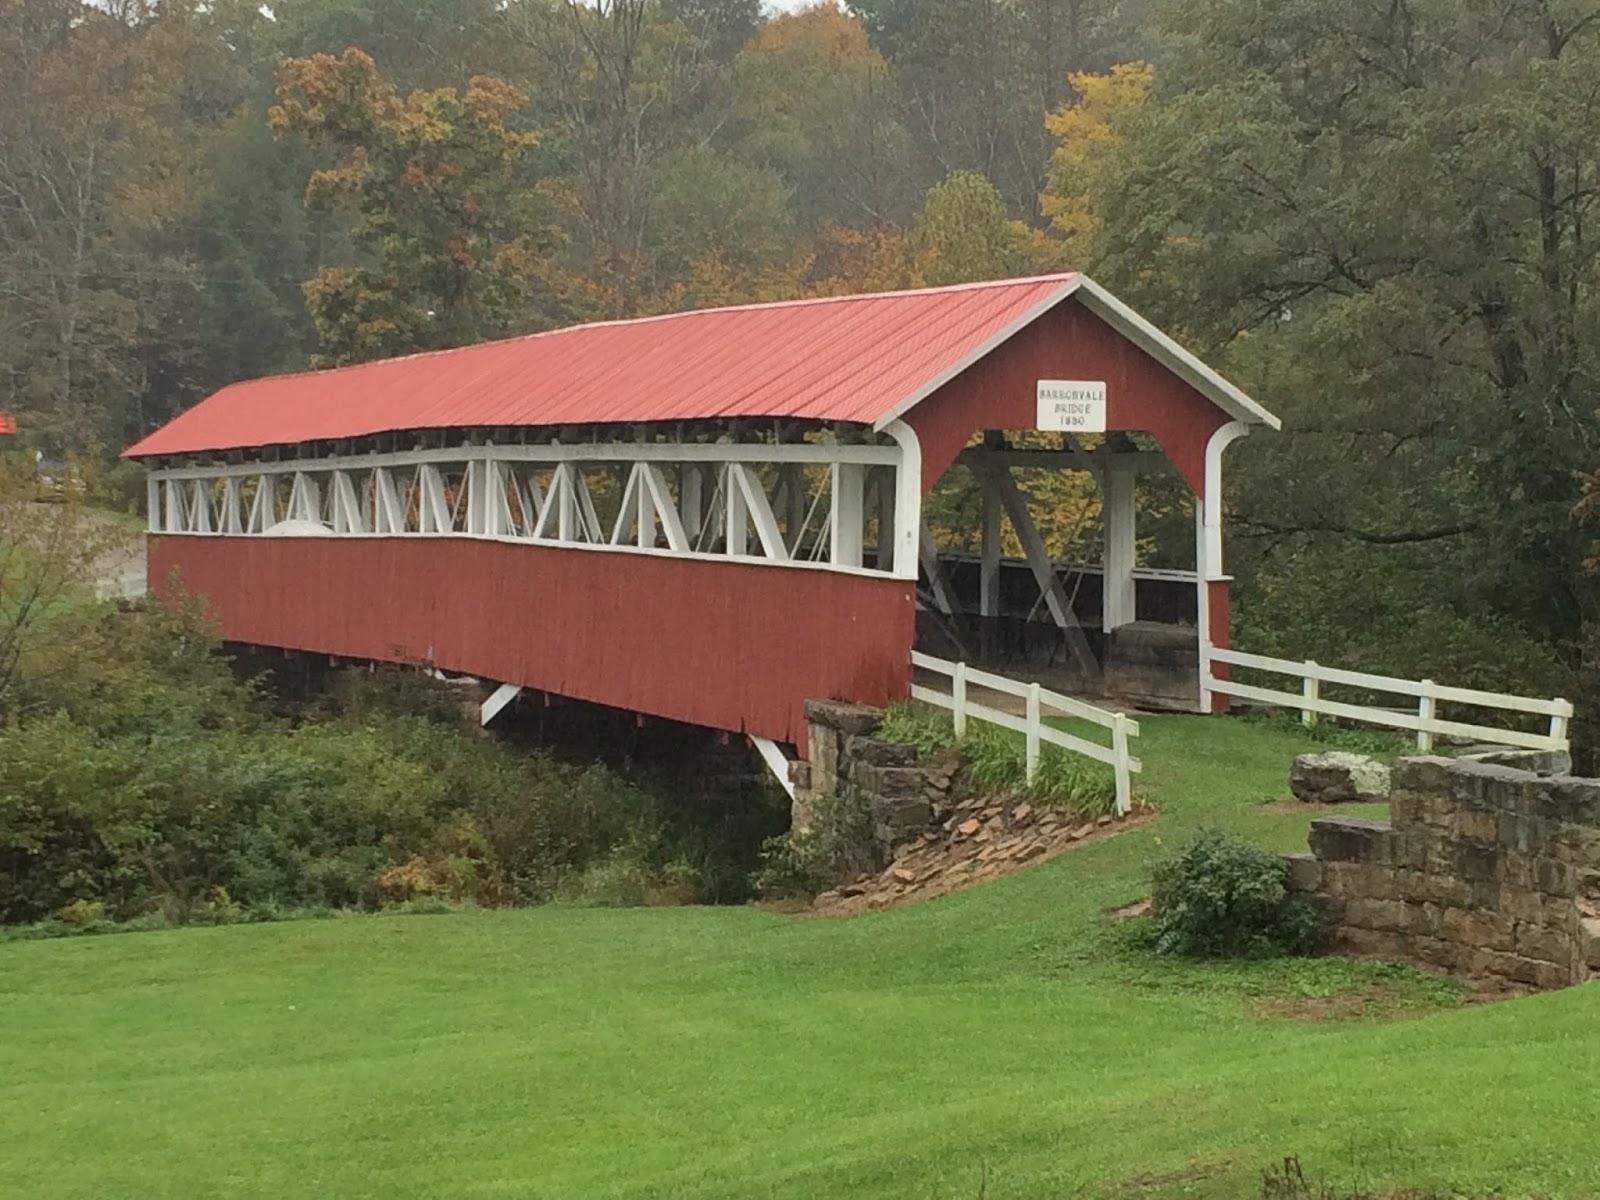 Barronvale and Kings Covered Bridges Barronvale PA Somerset County  Interesting Pennsylvania